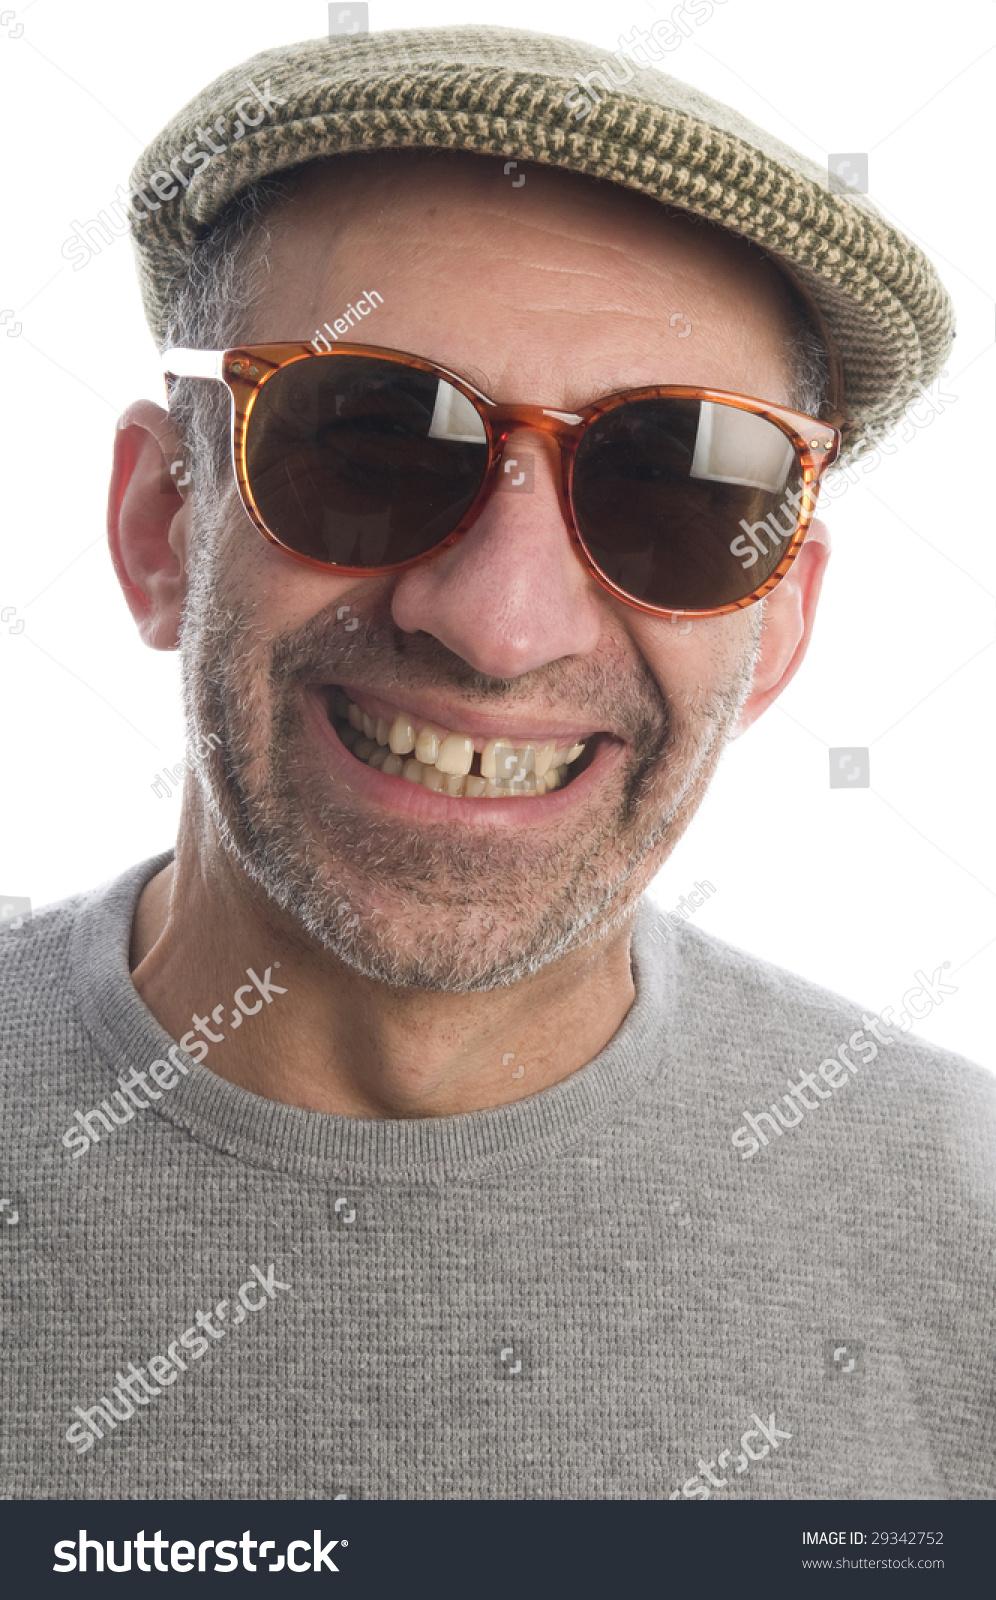 0748cb4b99019 middle age senior man wearing artist scottish tweed hat macro close up  distorted large nose face